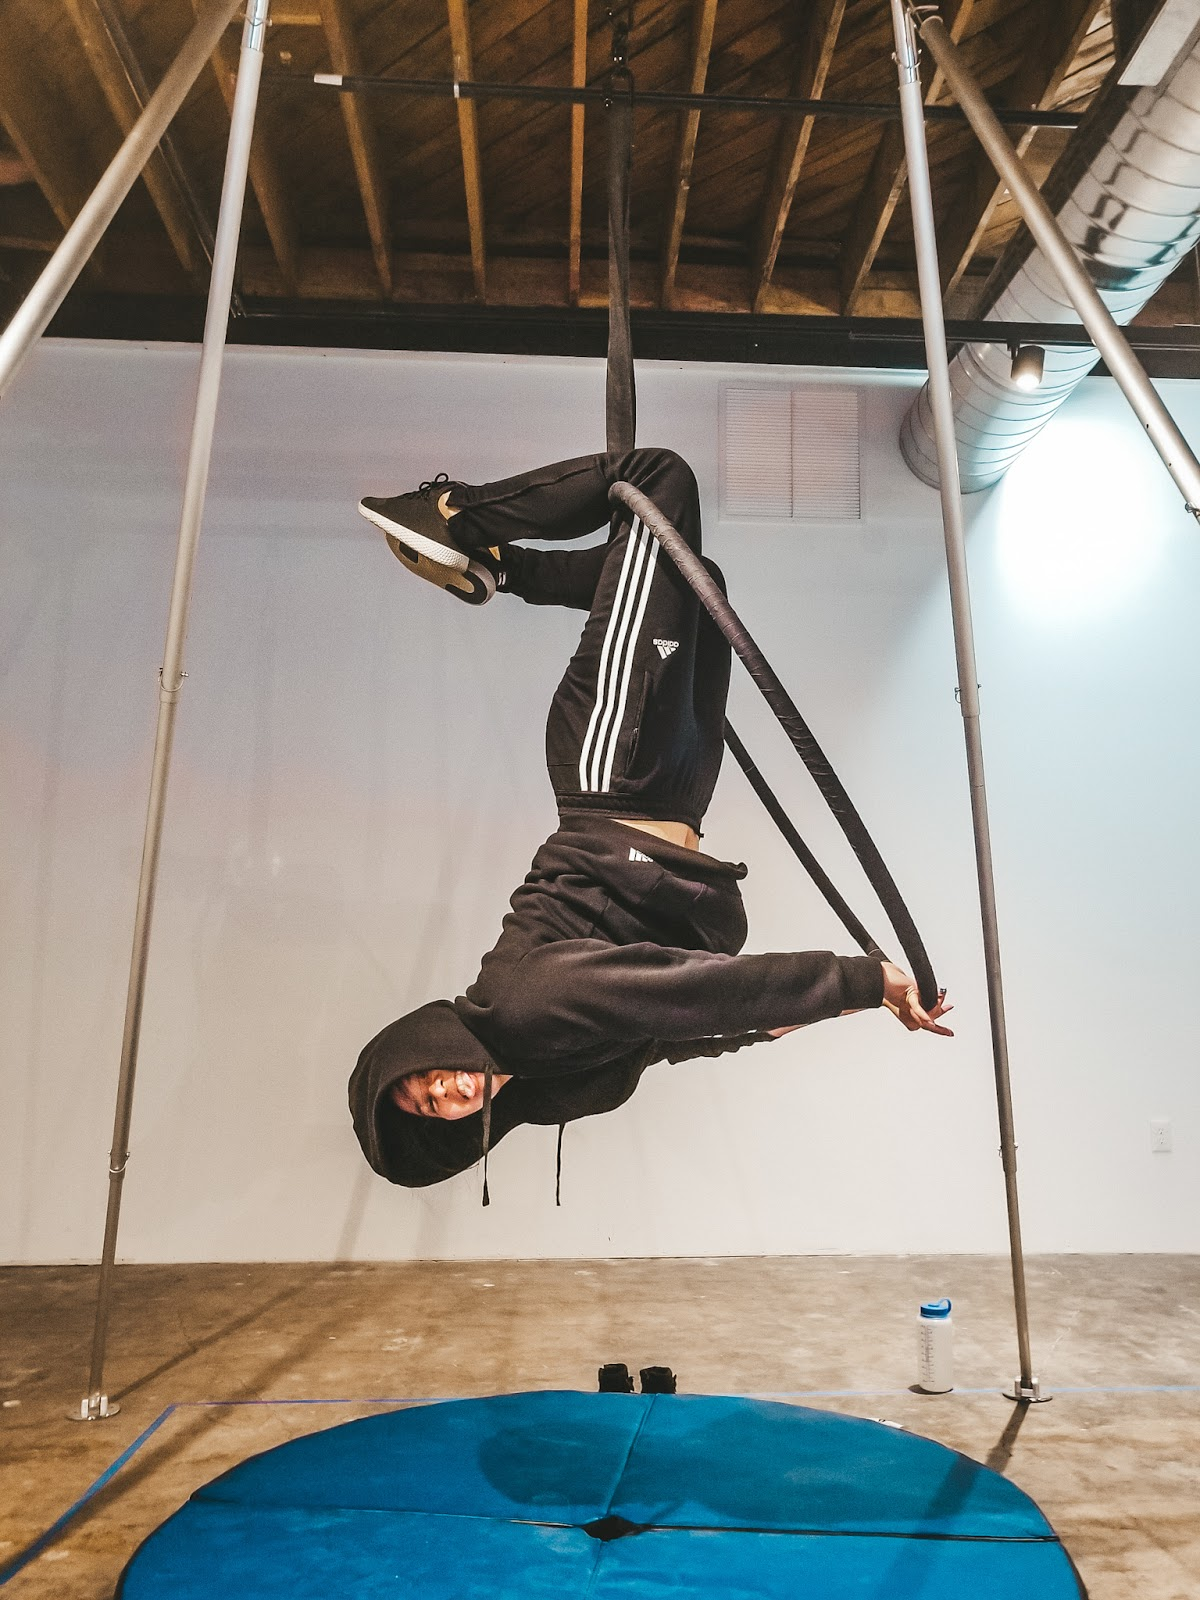 renton dance nonrprofit studio aerial hoop